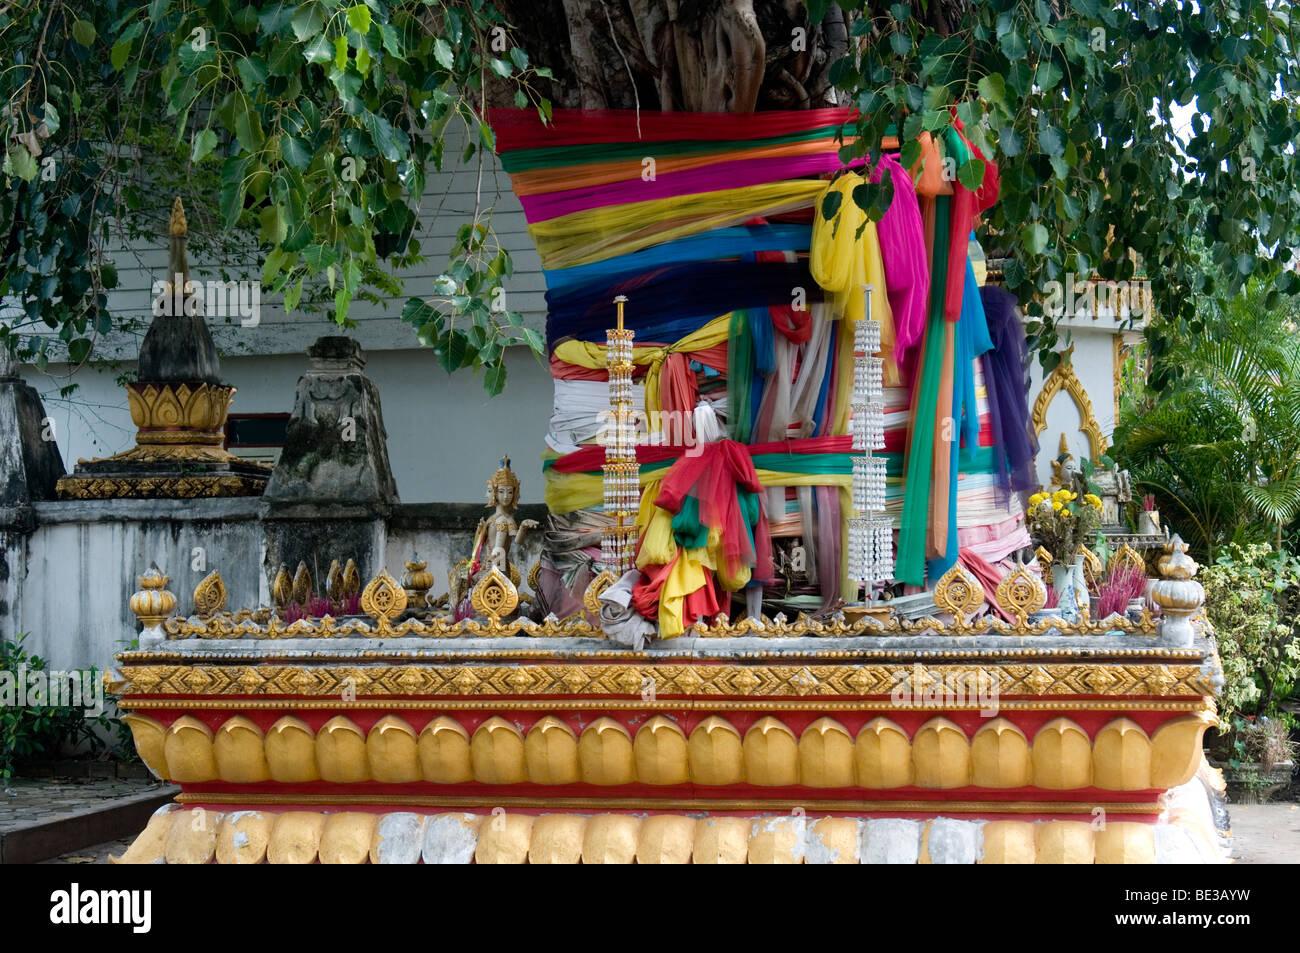 Banyan tree at Boun Khao Salak festival, Savannakhet, Laos - Stock Image